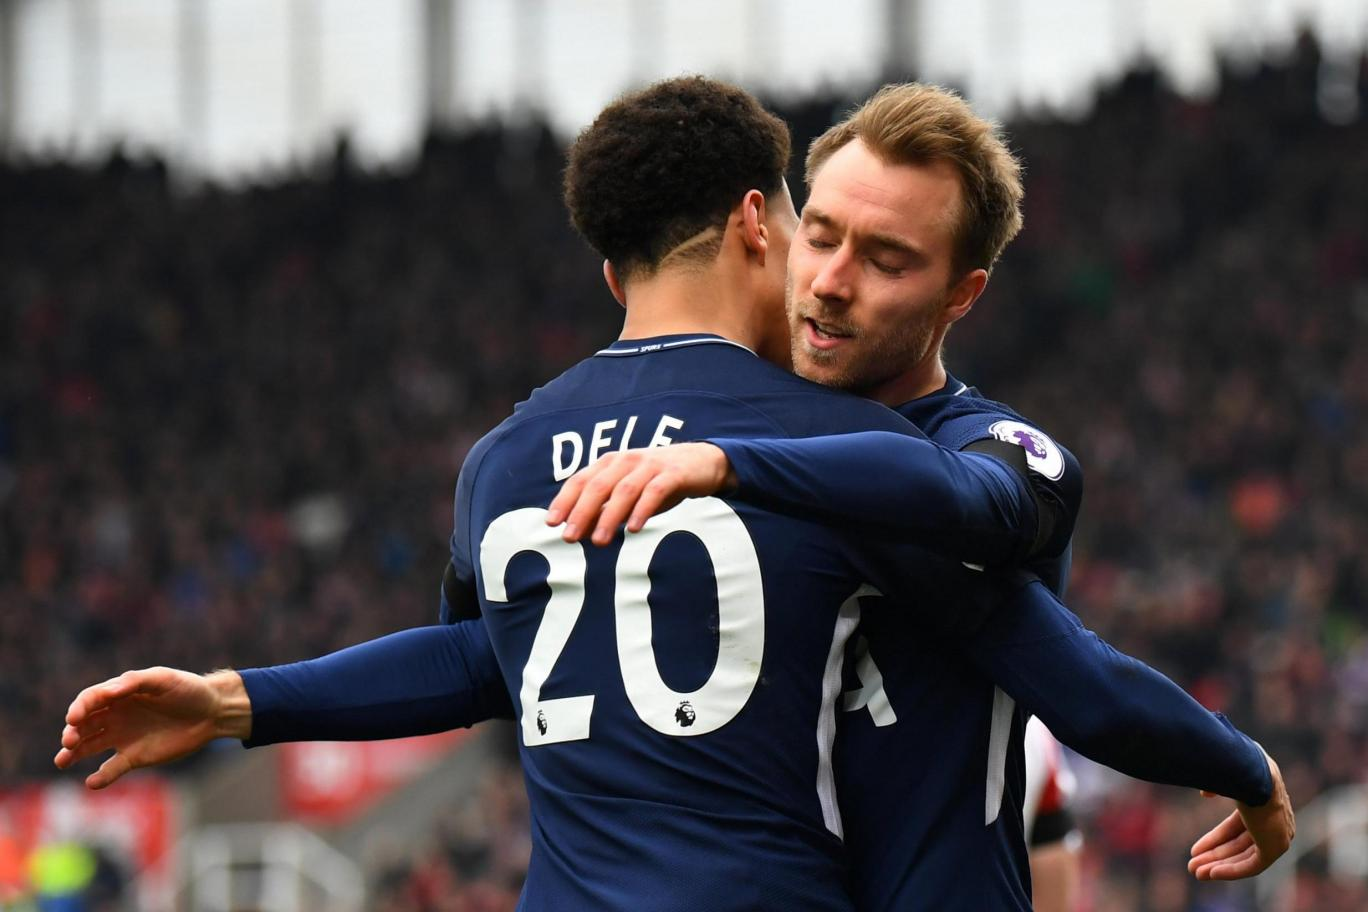 Tottenham's Dele Alli and Christian Eriksen celebrate a goal. (Getty Images)